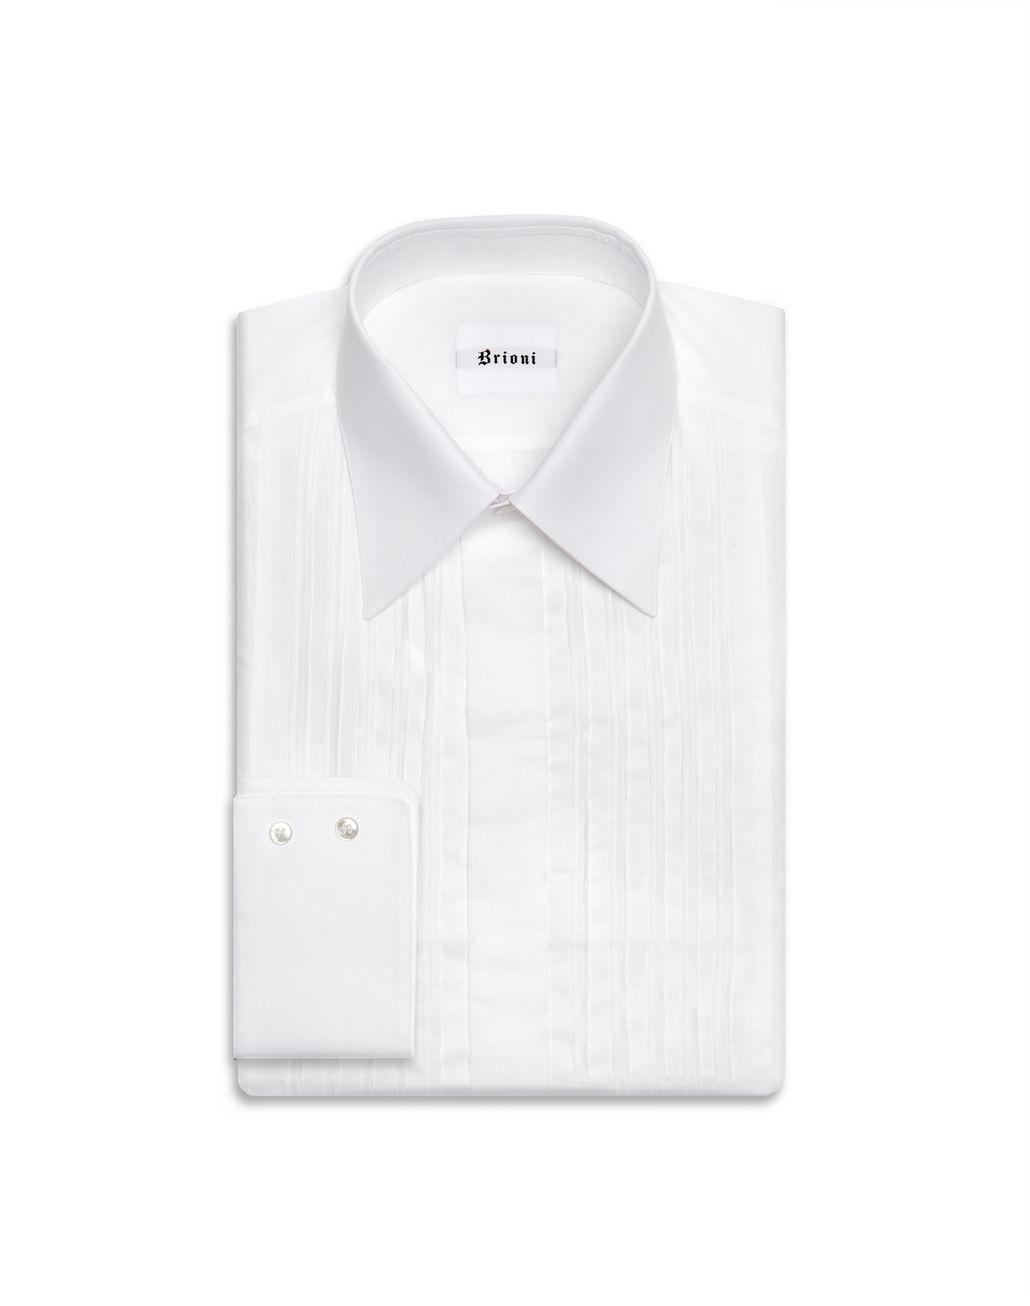 BRIONI 吸烟装衬衫 正装衬衫 男士 f